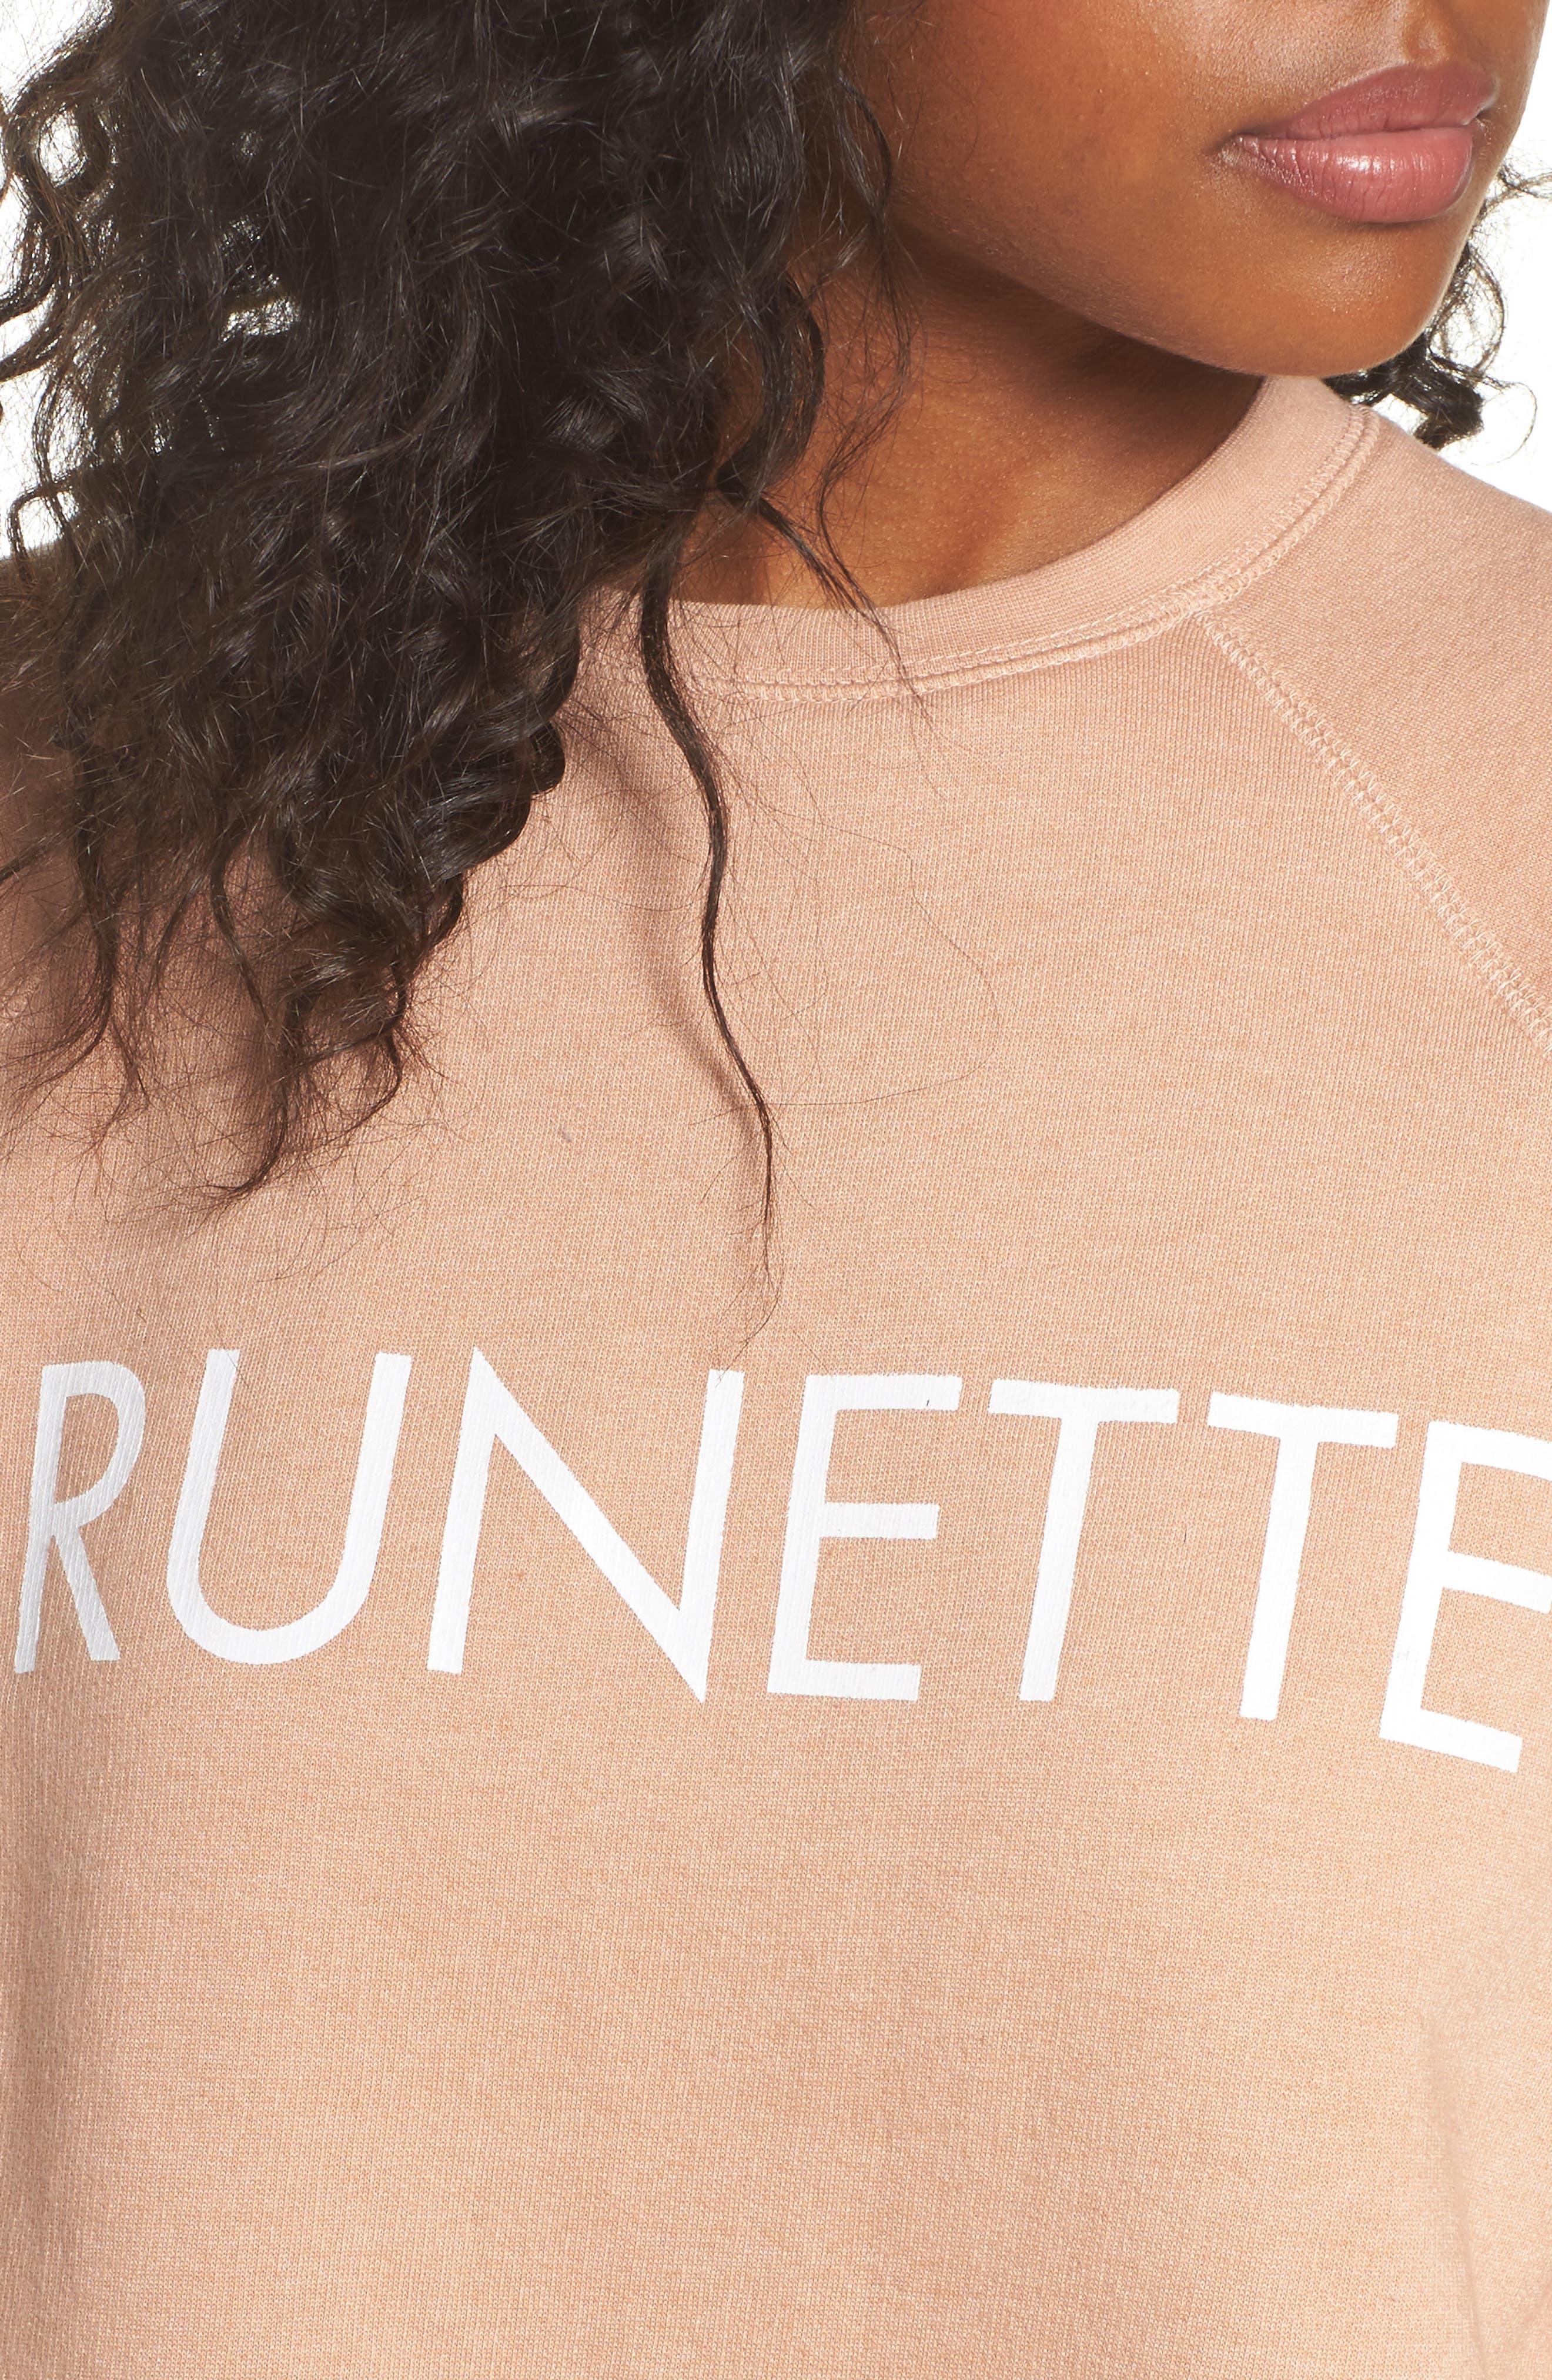 Middle Sister Brunette Sweatshirt,                             Alternate thumbnail 4, color,                             950